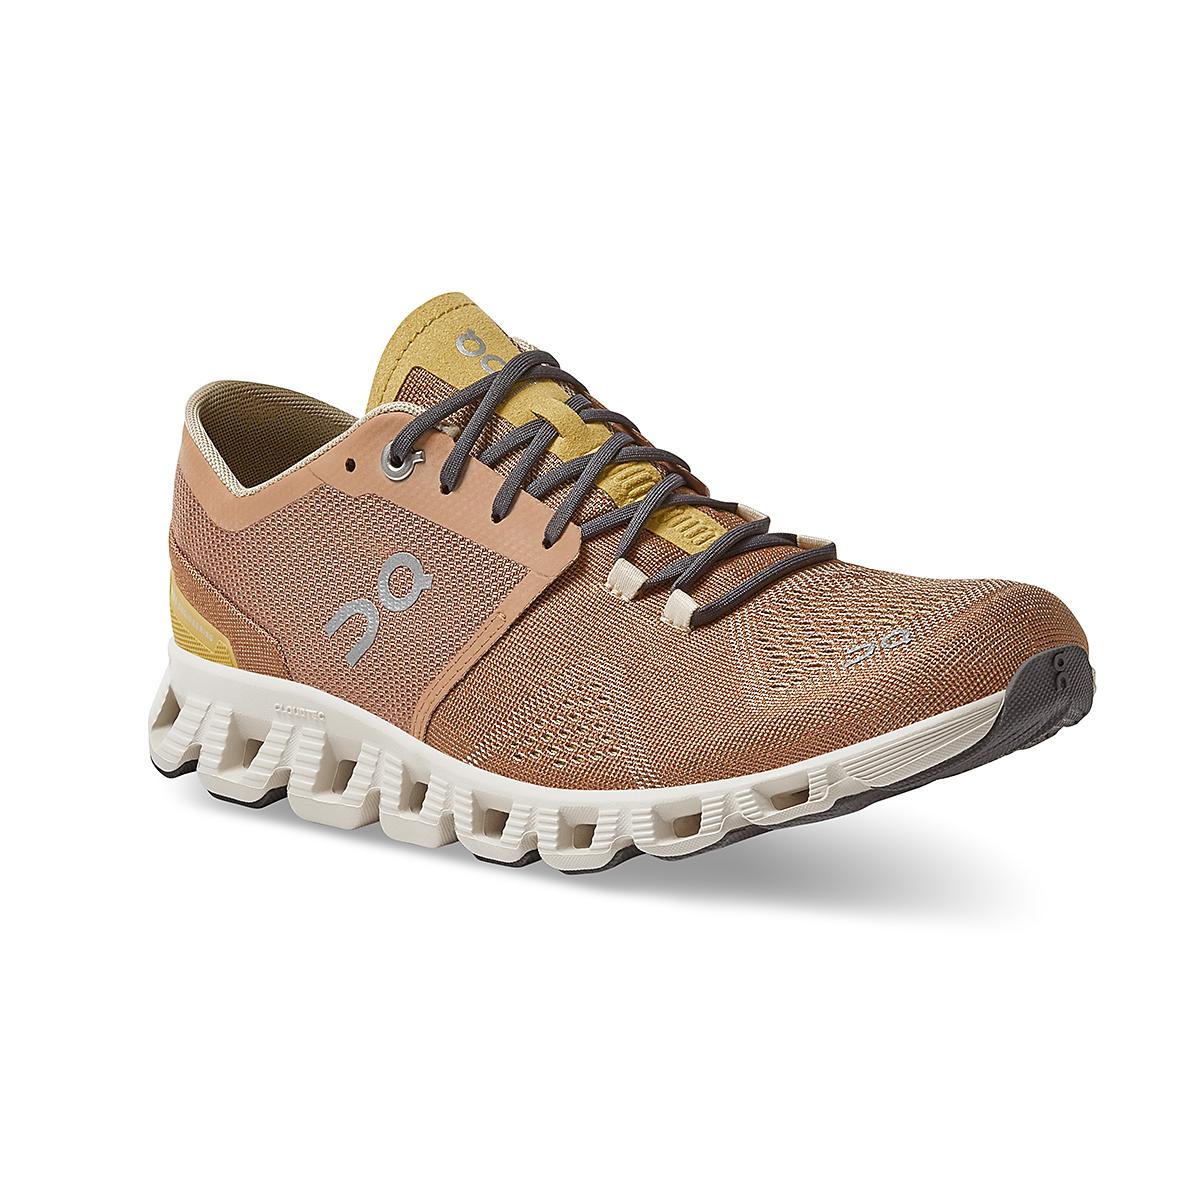 Women's On Cloud X 2.0 Training Shoe - Color: Mocha/Sand - Size: 5 - Width: Regular, Mocha/Sand, large, image 2